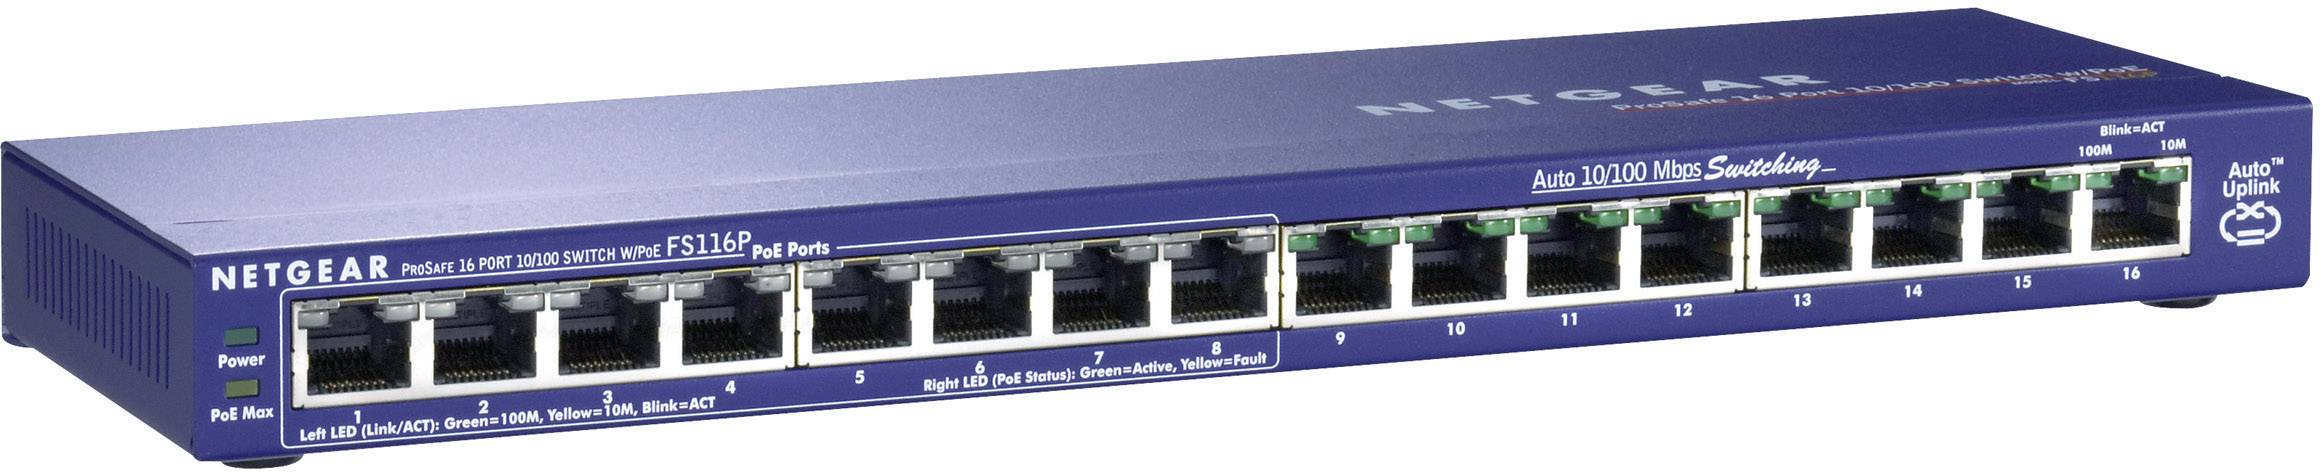 Sieťový switch RJ45 NETGEAR FS116P, 16 portov, 100 Mbit/s, funkcia PoE